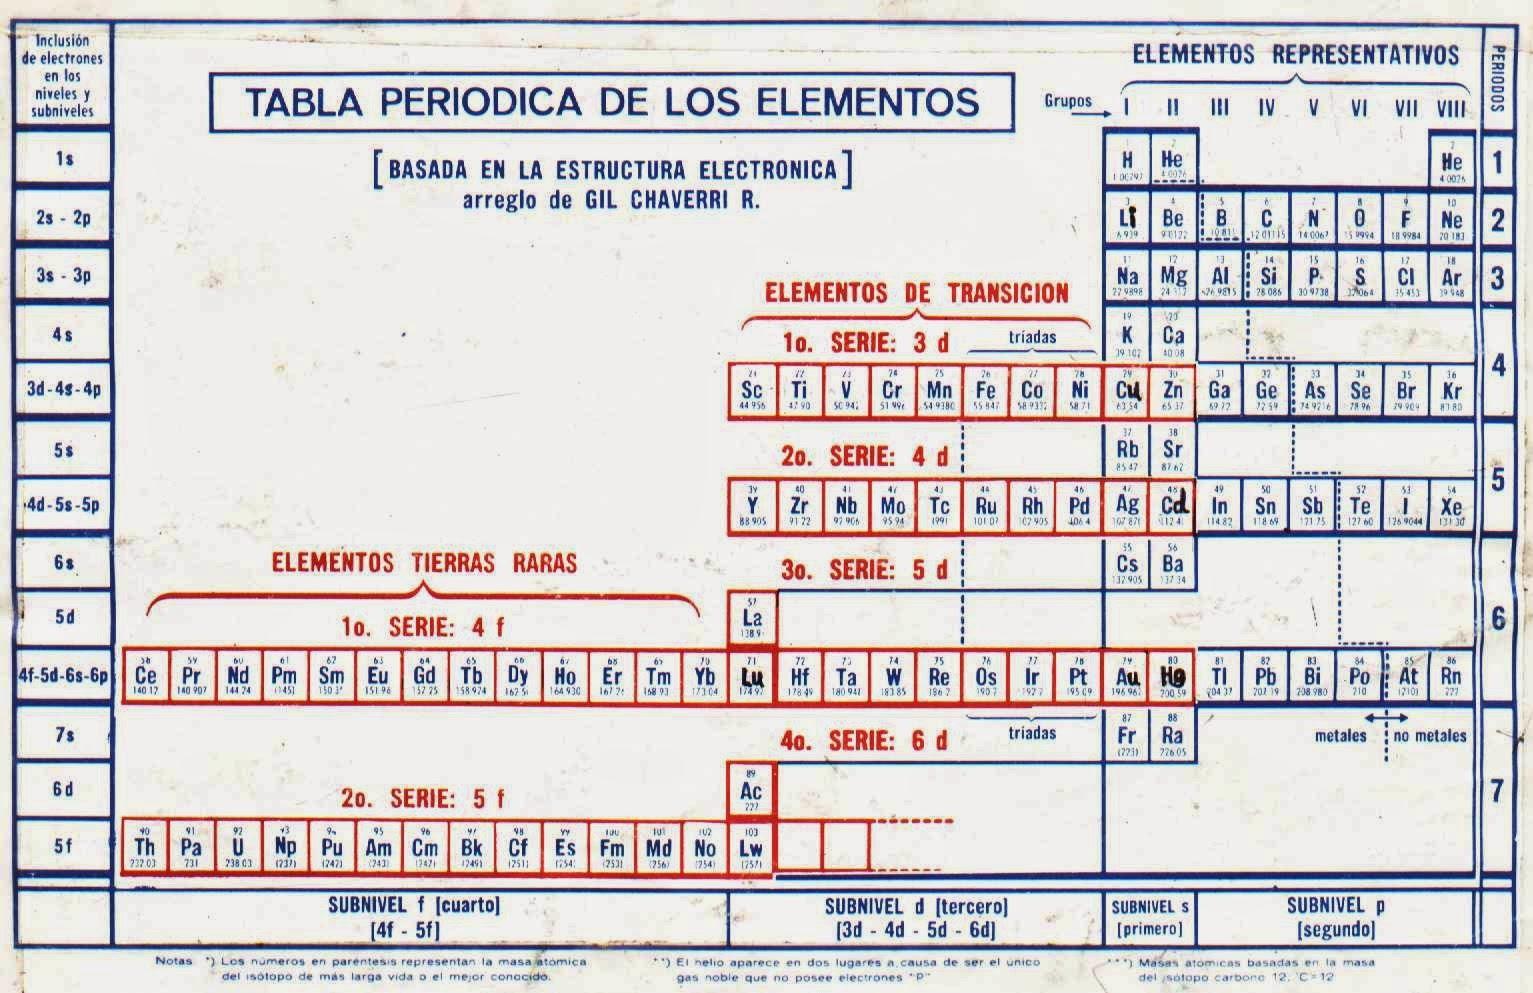 Aula virtual fisicoqu mica 2do a o escuela n 3015 for Ptable and r